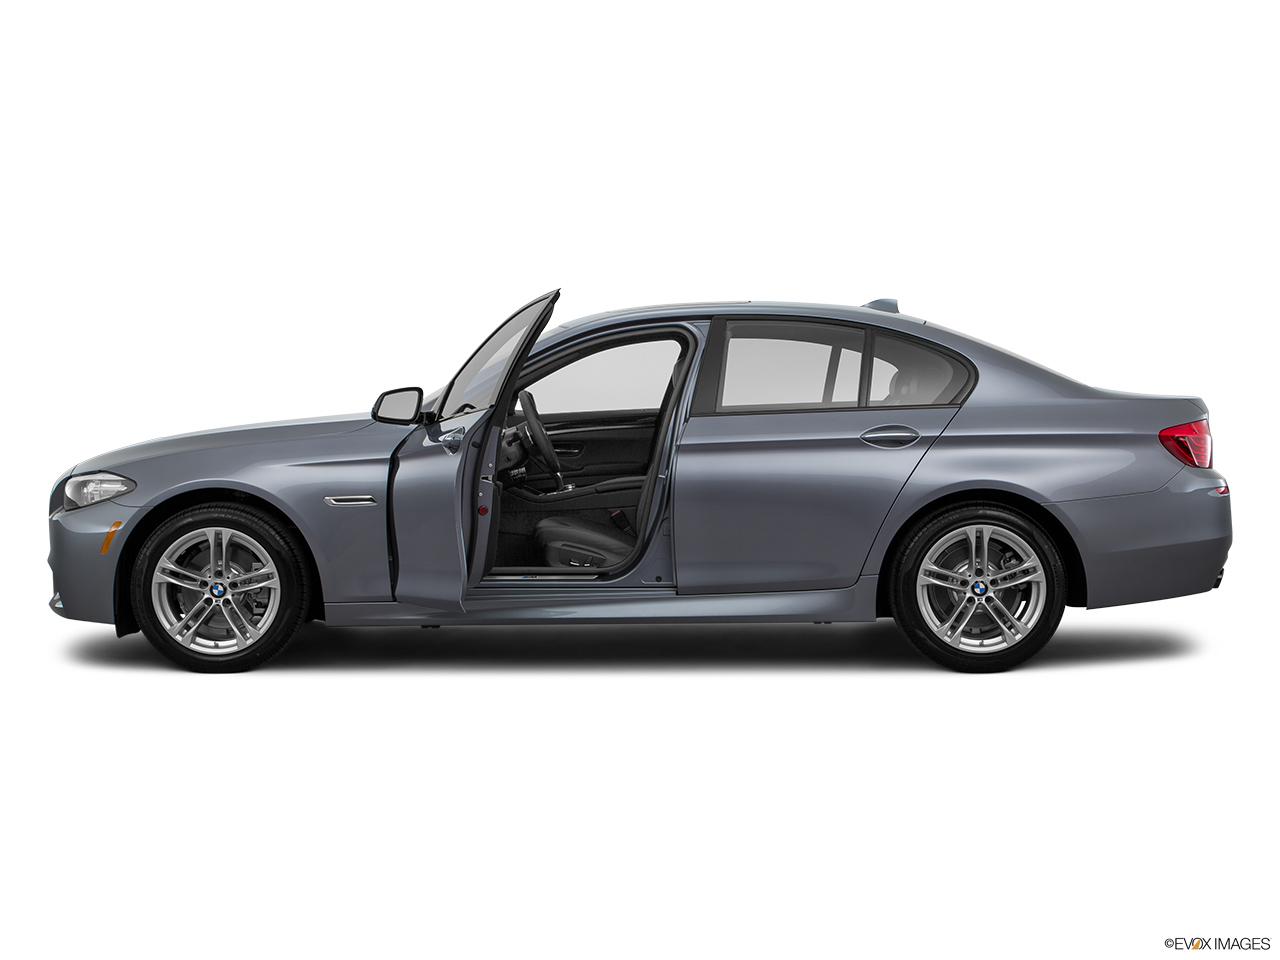 Bmw 5 Series Gran Turismo 2016 528i In Uae New Car Prices